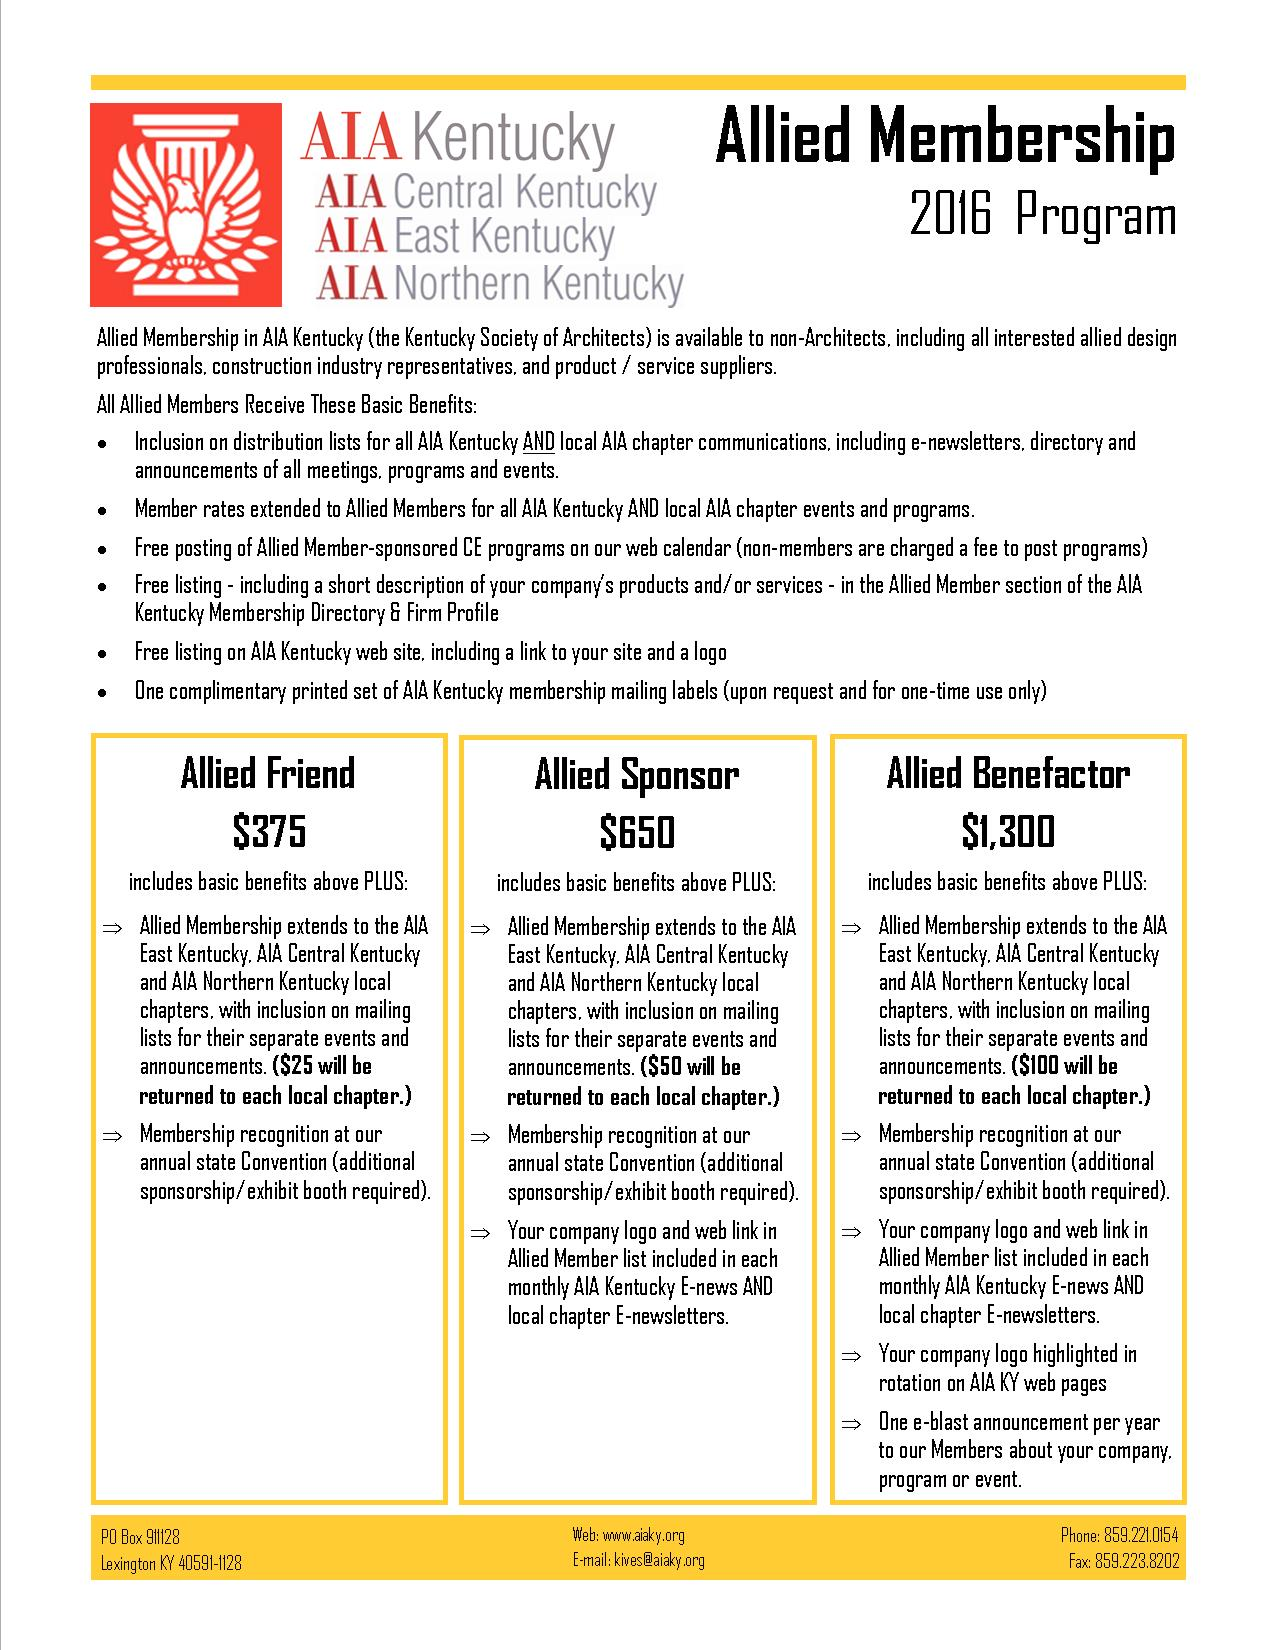 2016 Allied Membership Description